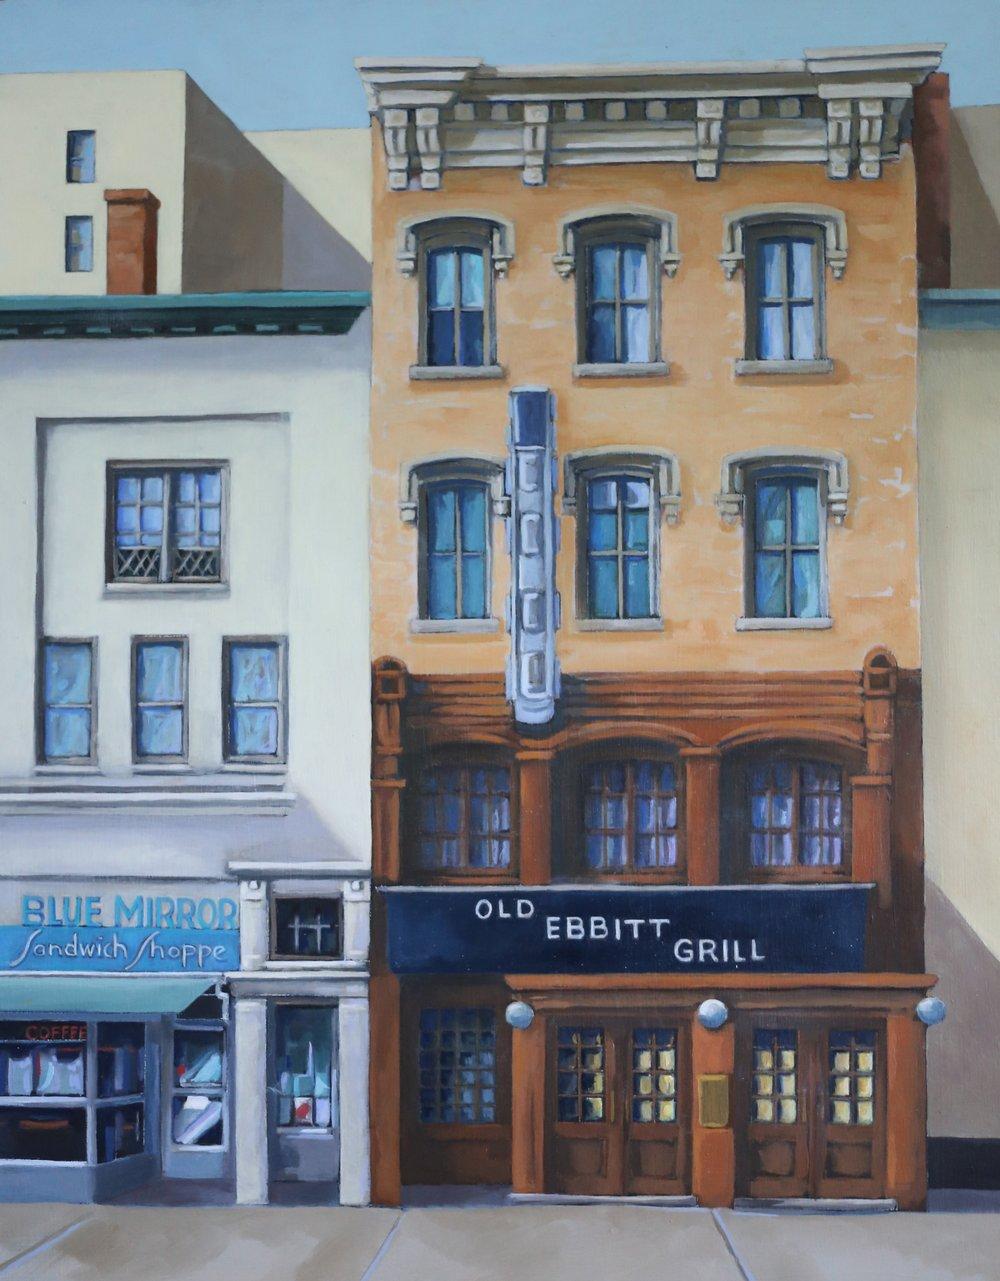 The Original Old Ebbitt Grill (Washington DC Landmark)